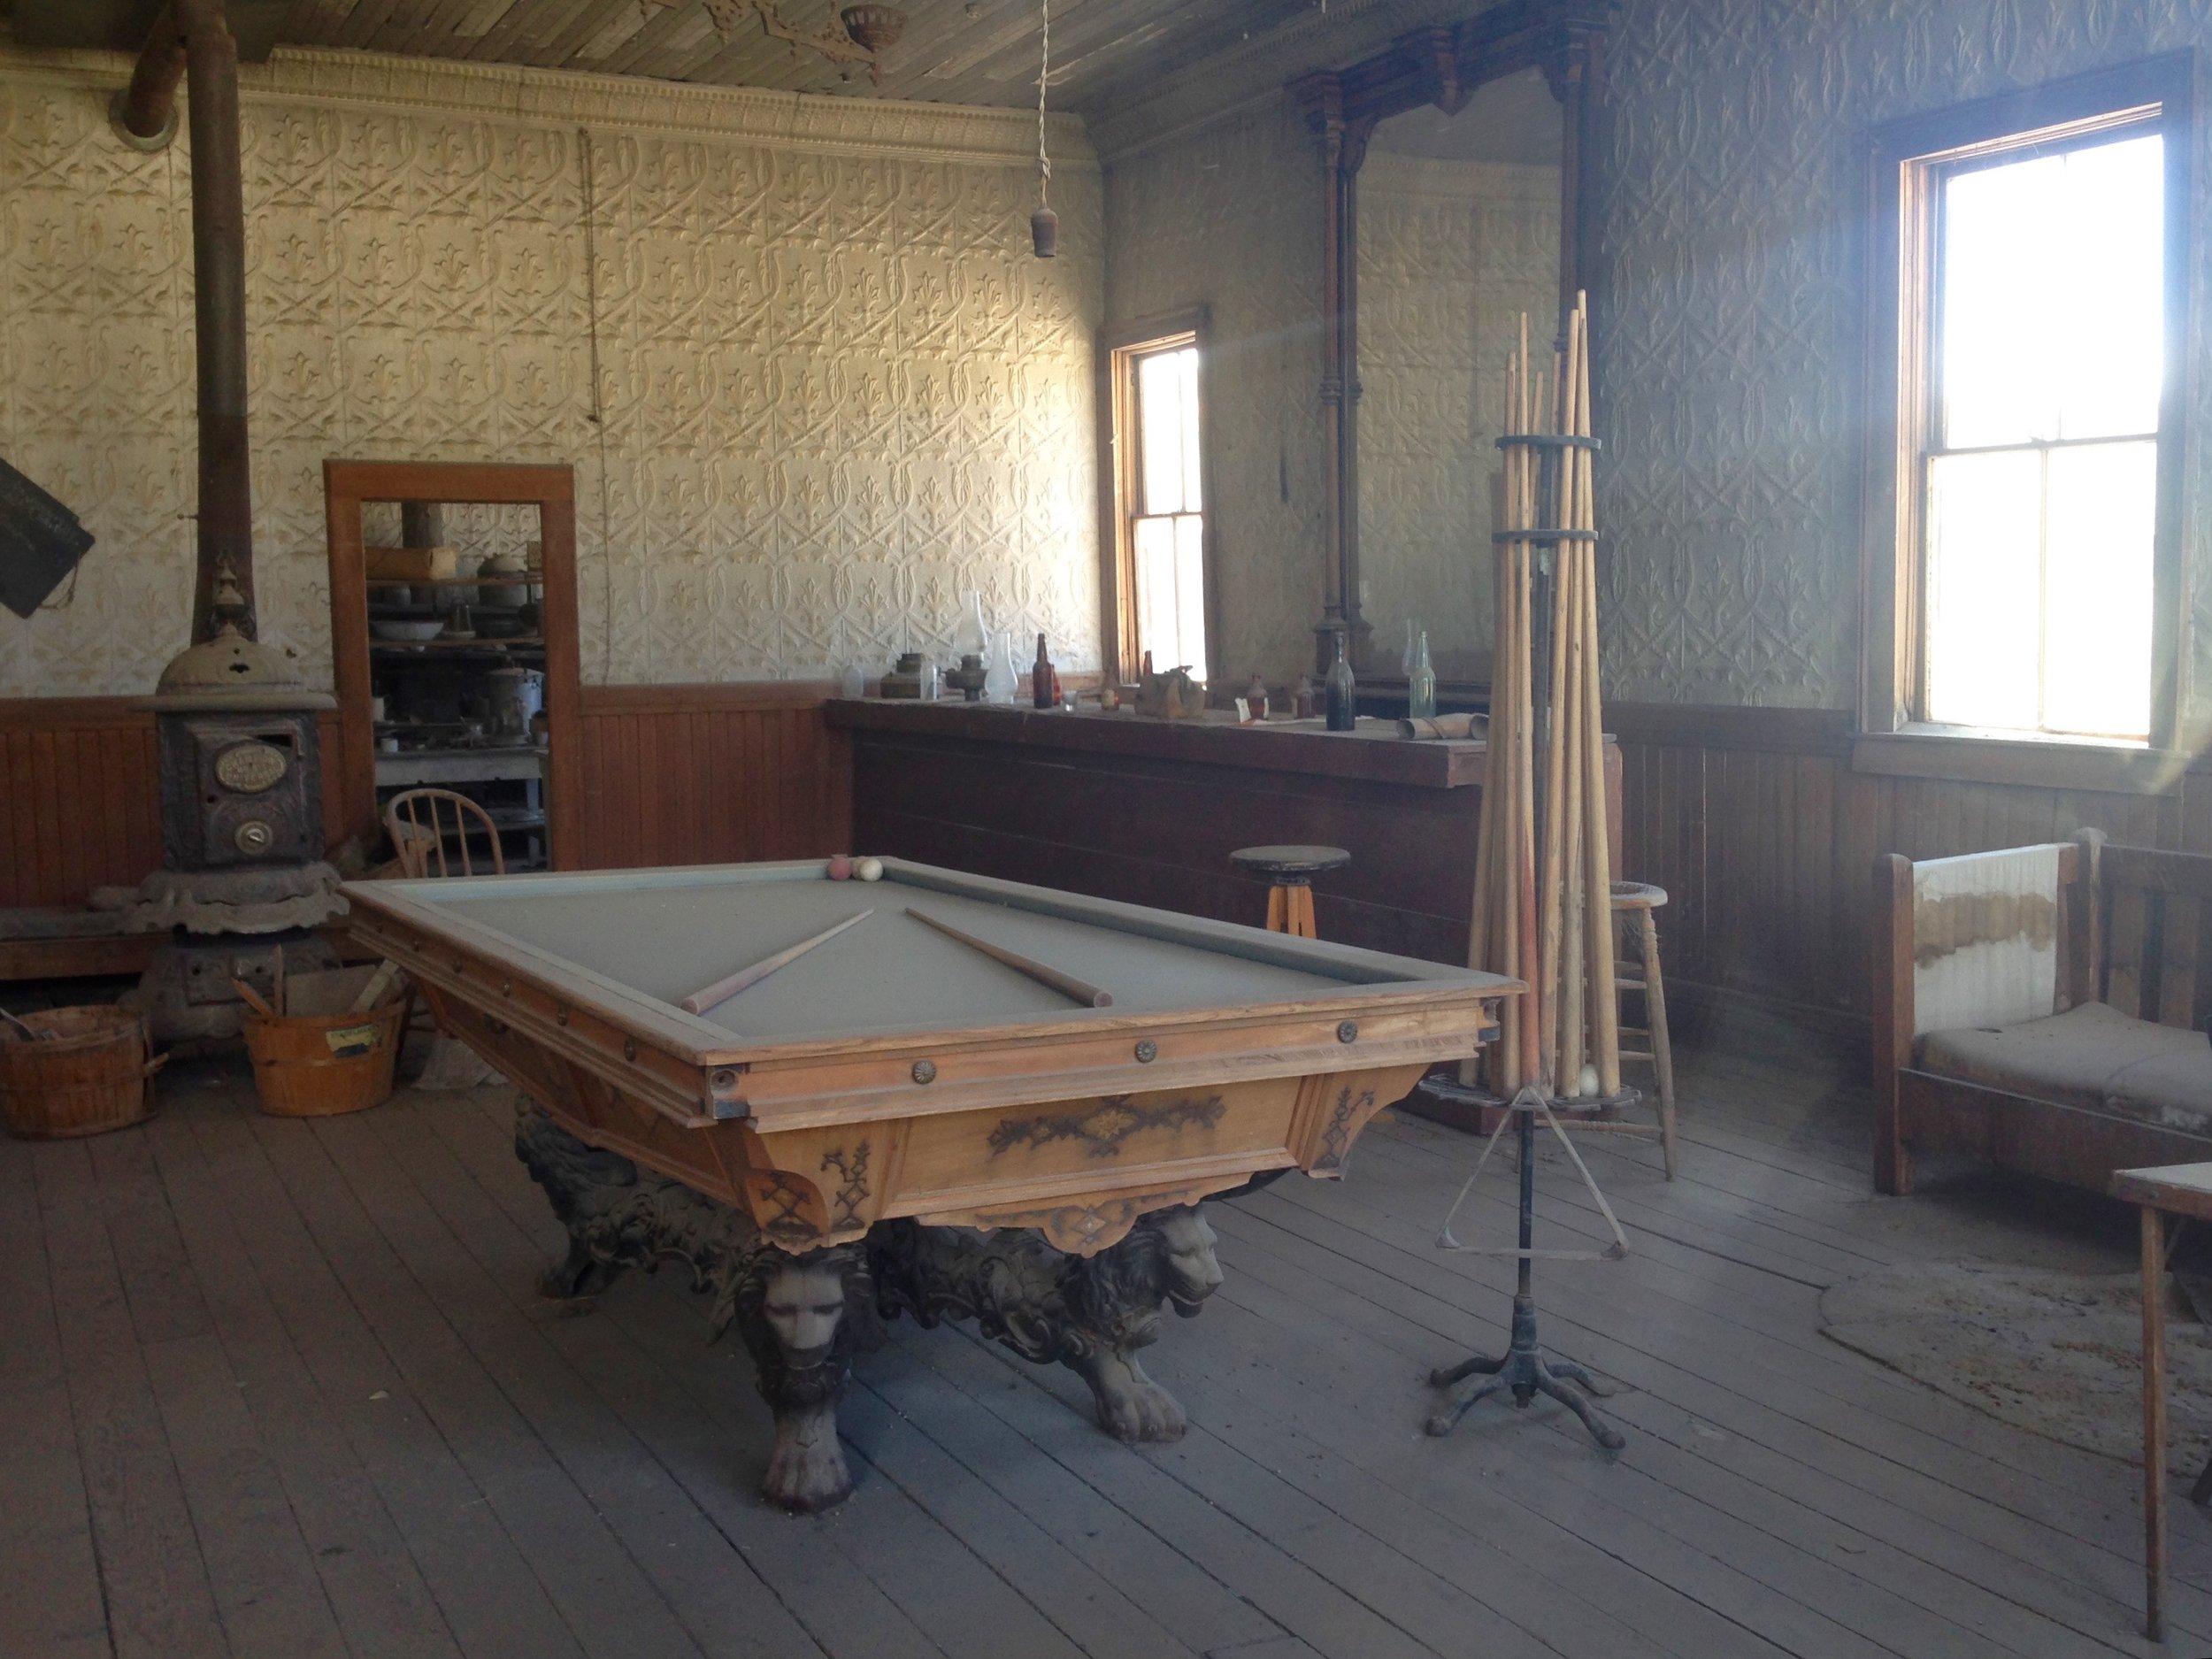 Pool Table at the Wheaton & Hollis Hotel